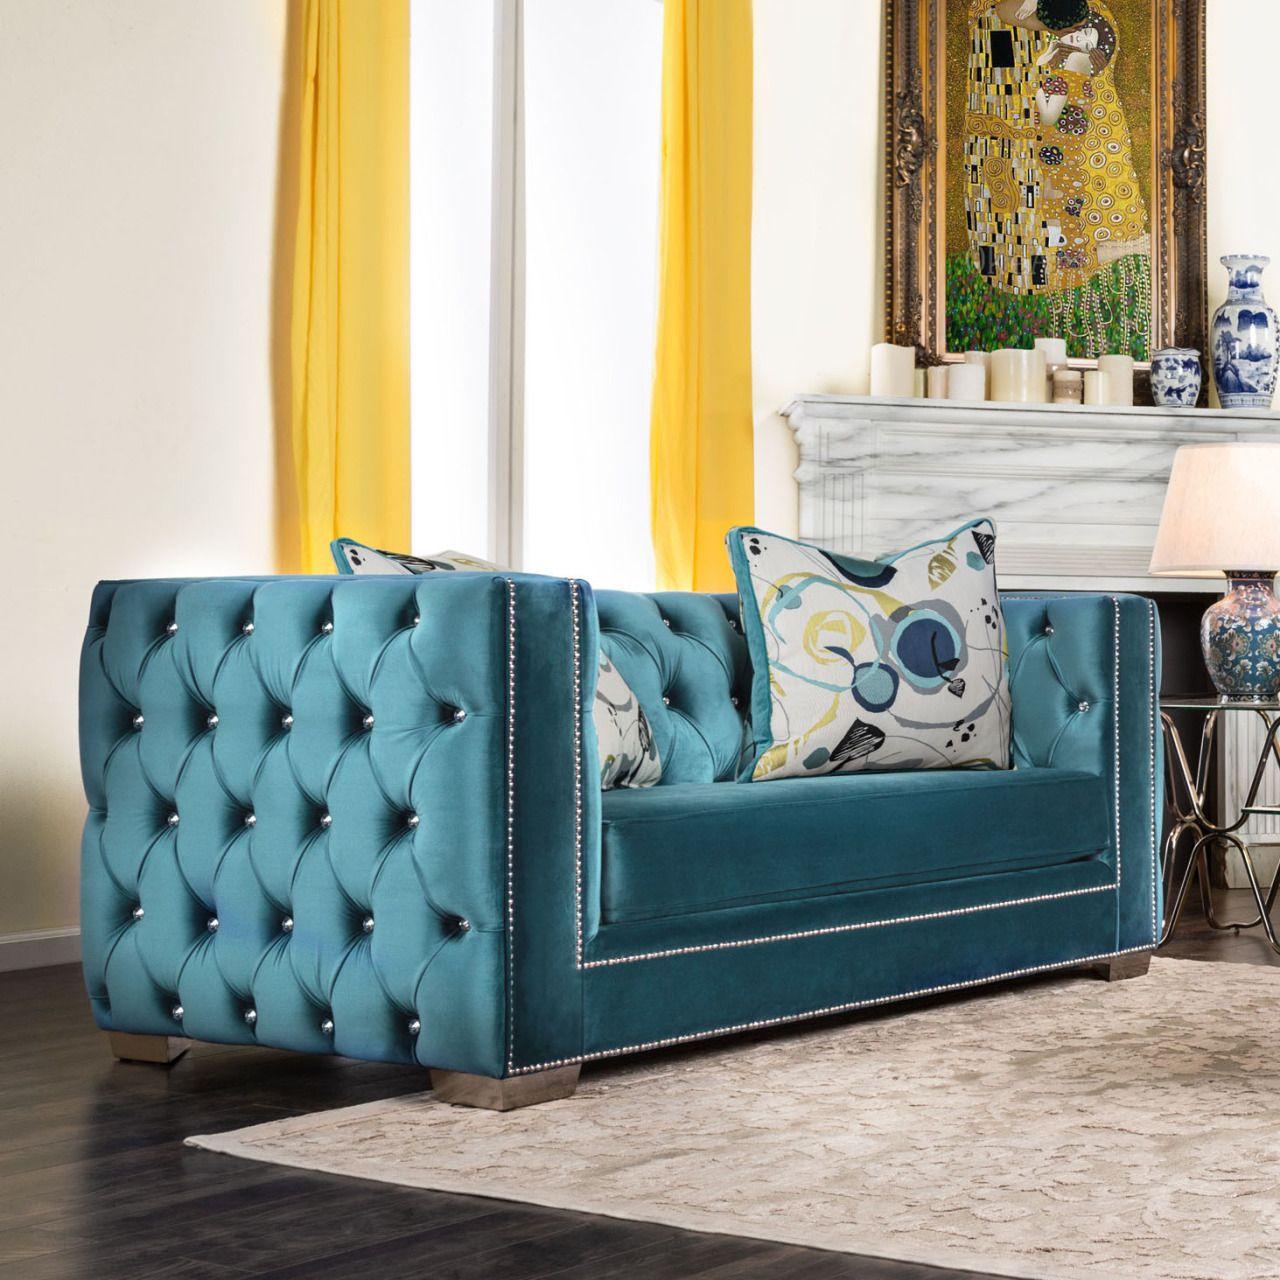 Tumblr Love Seat Furniture Furniture Of America